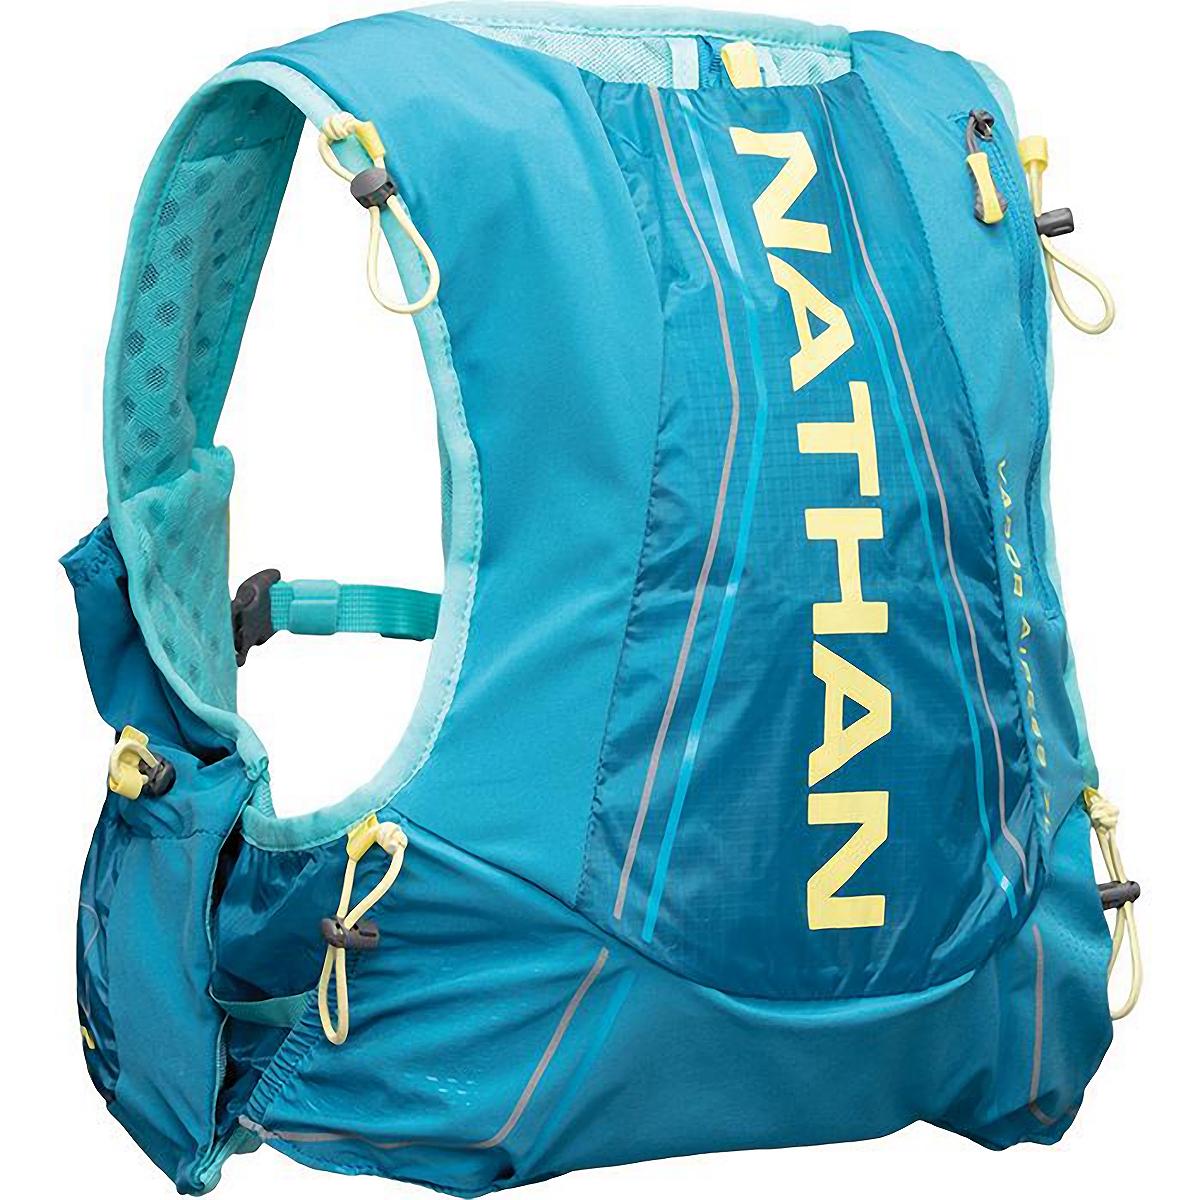 Nathan Vaporairess 2.0 7 Liter Hydration Pack - Color: Blue Jay/Blue Radiance - Size: XXS-M, Blue Jay/Blue Radiance, large, image 2